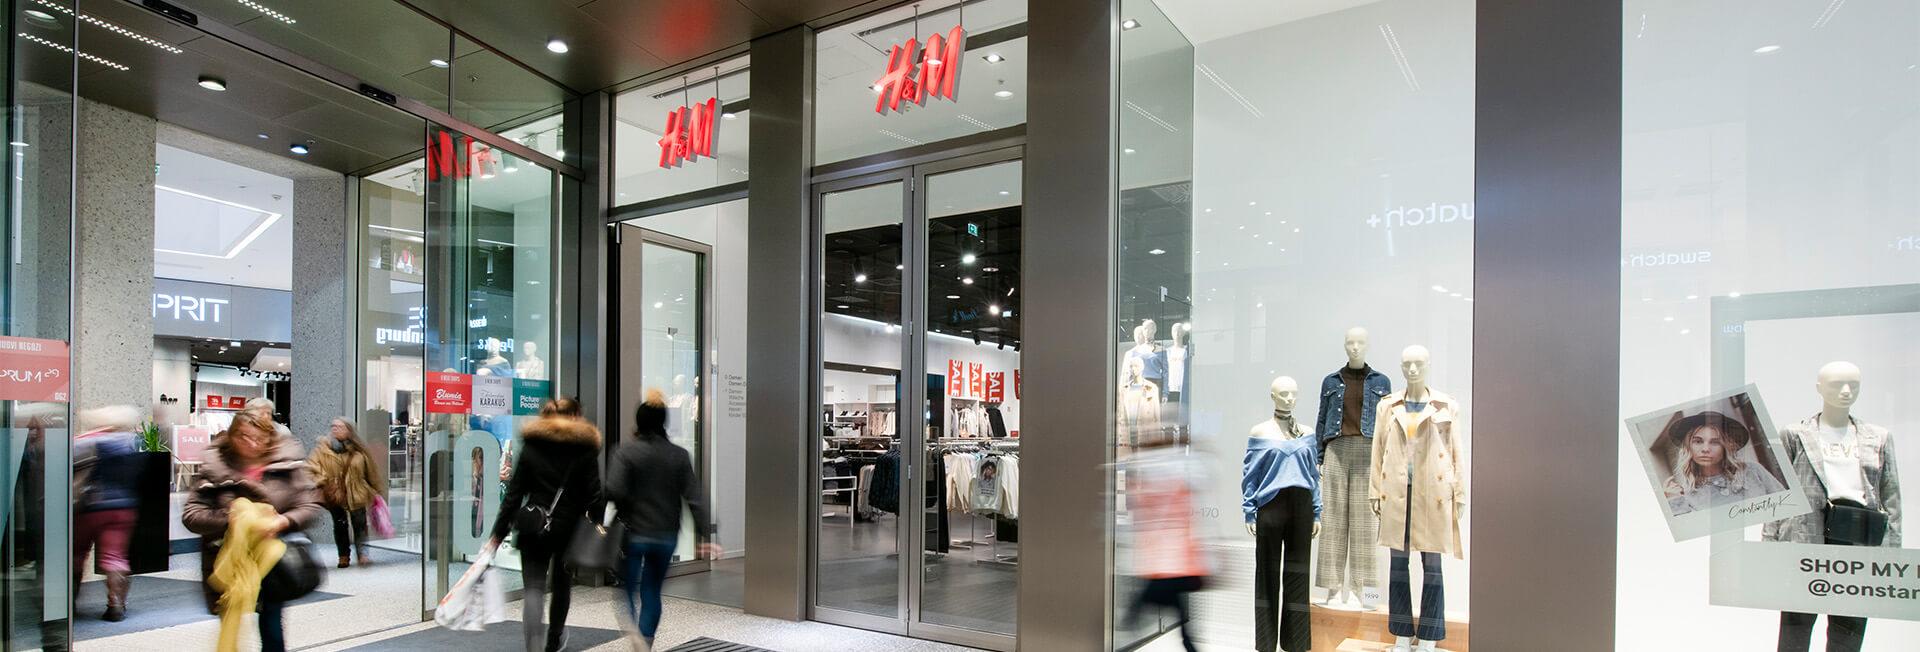 H&M im Kaufhaus Tyrol